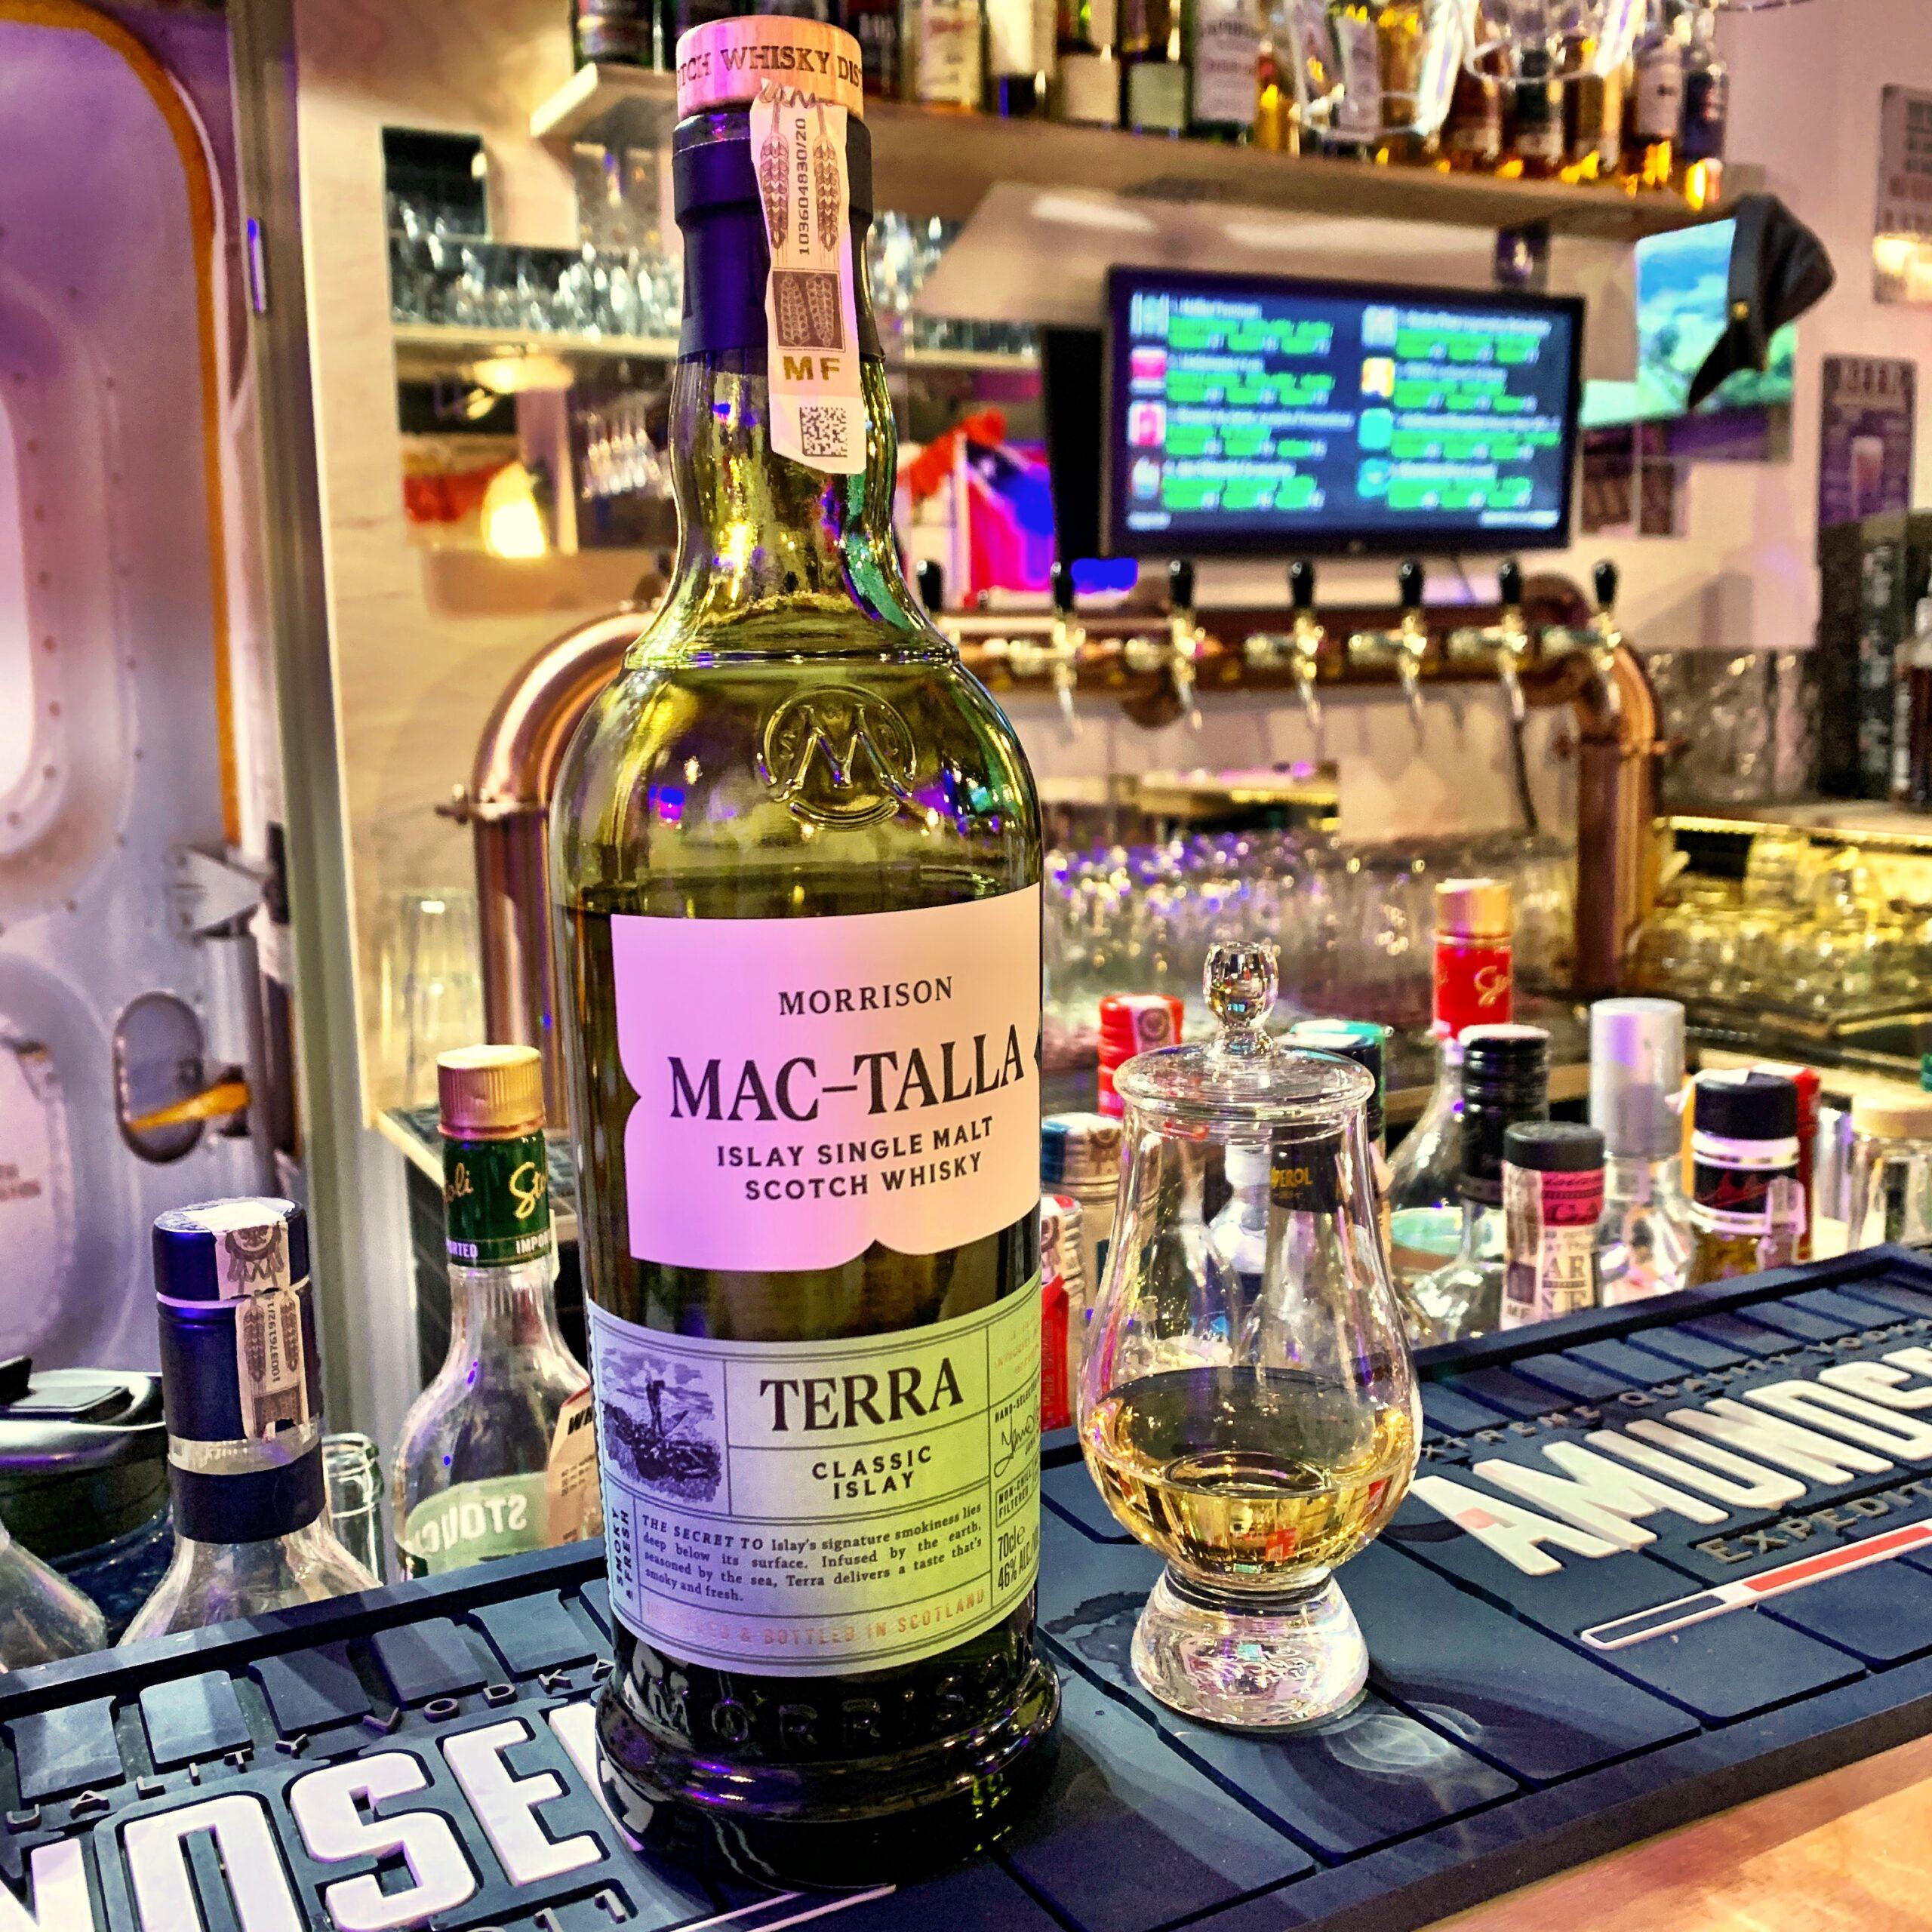 Mac-Talla Terra 46% - single malt whisky